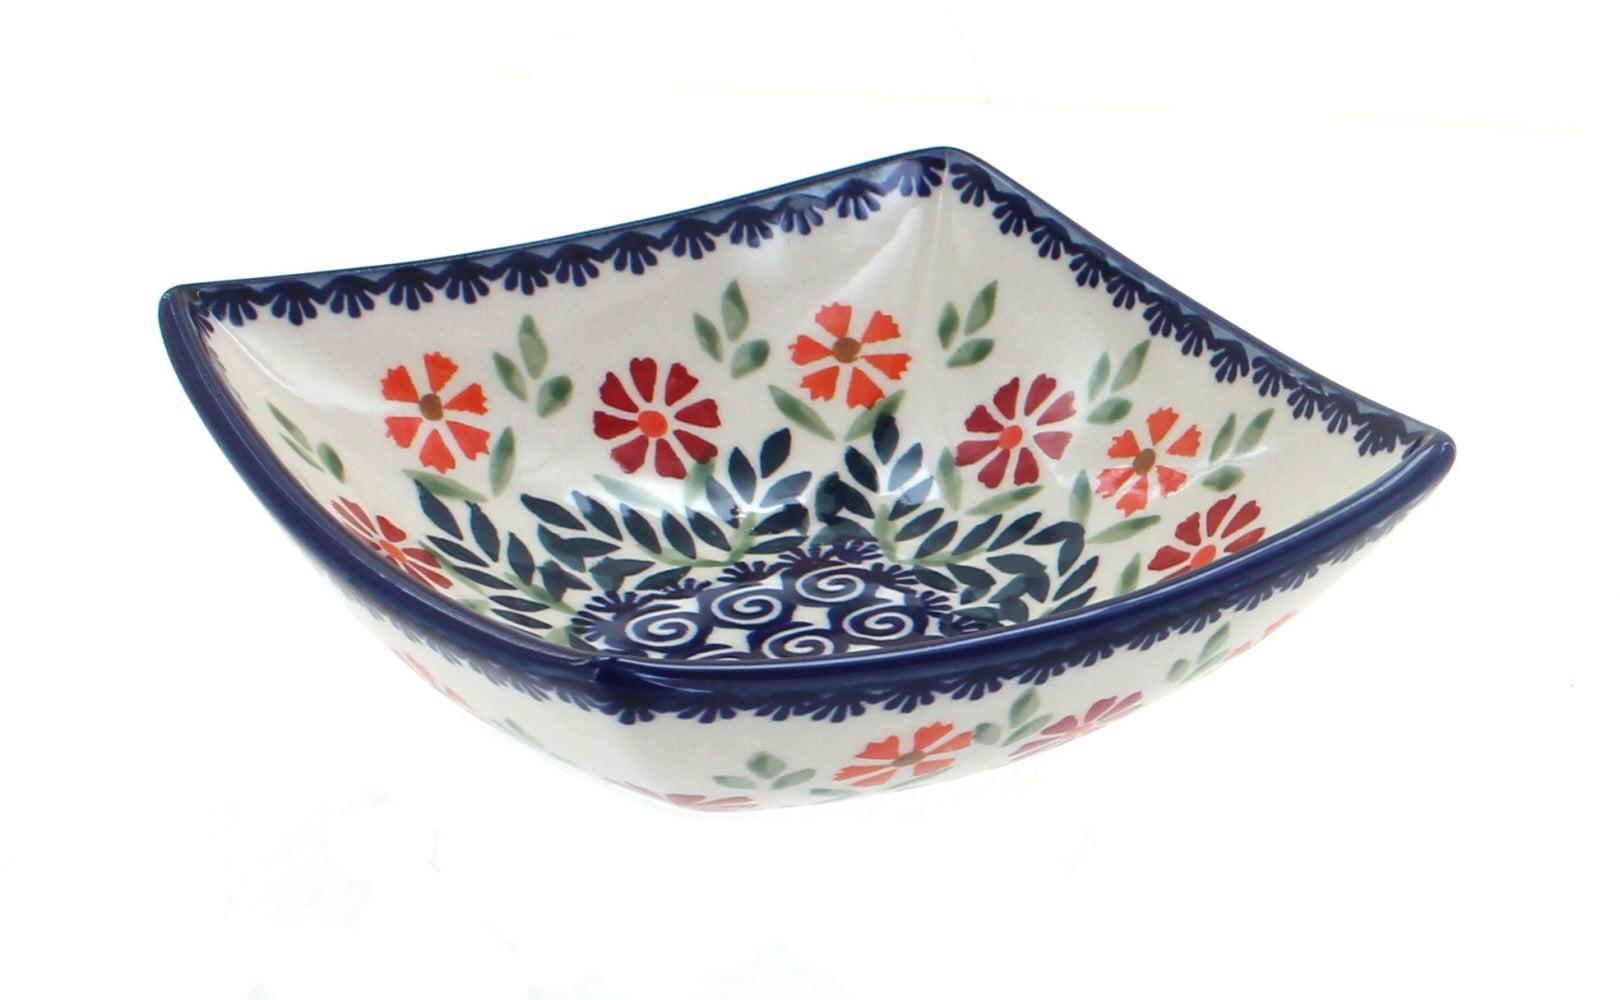 Mosaic Flower Egg Cup Set Polish Pottery